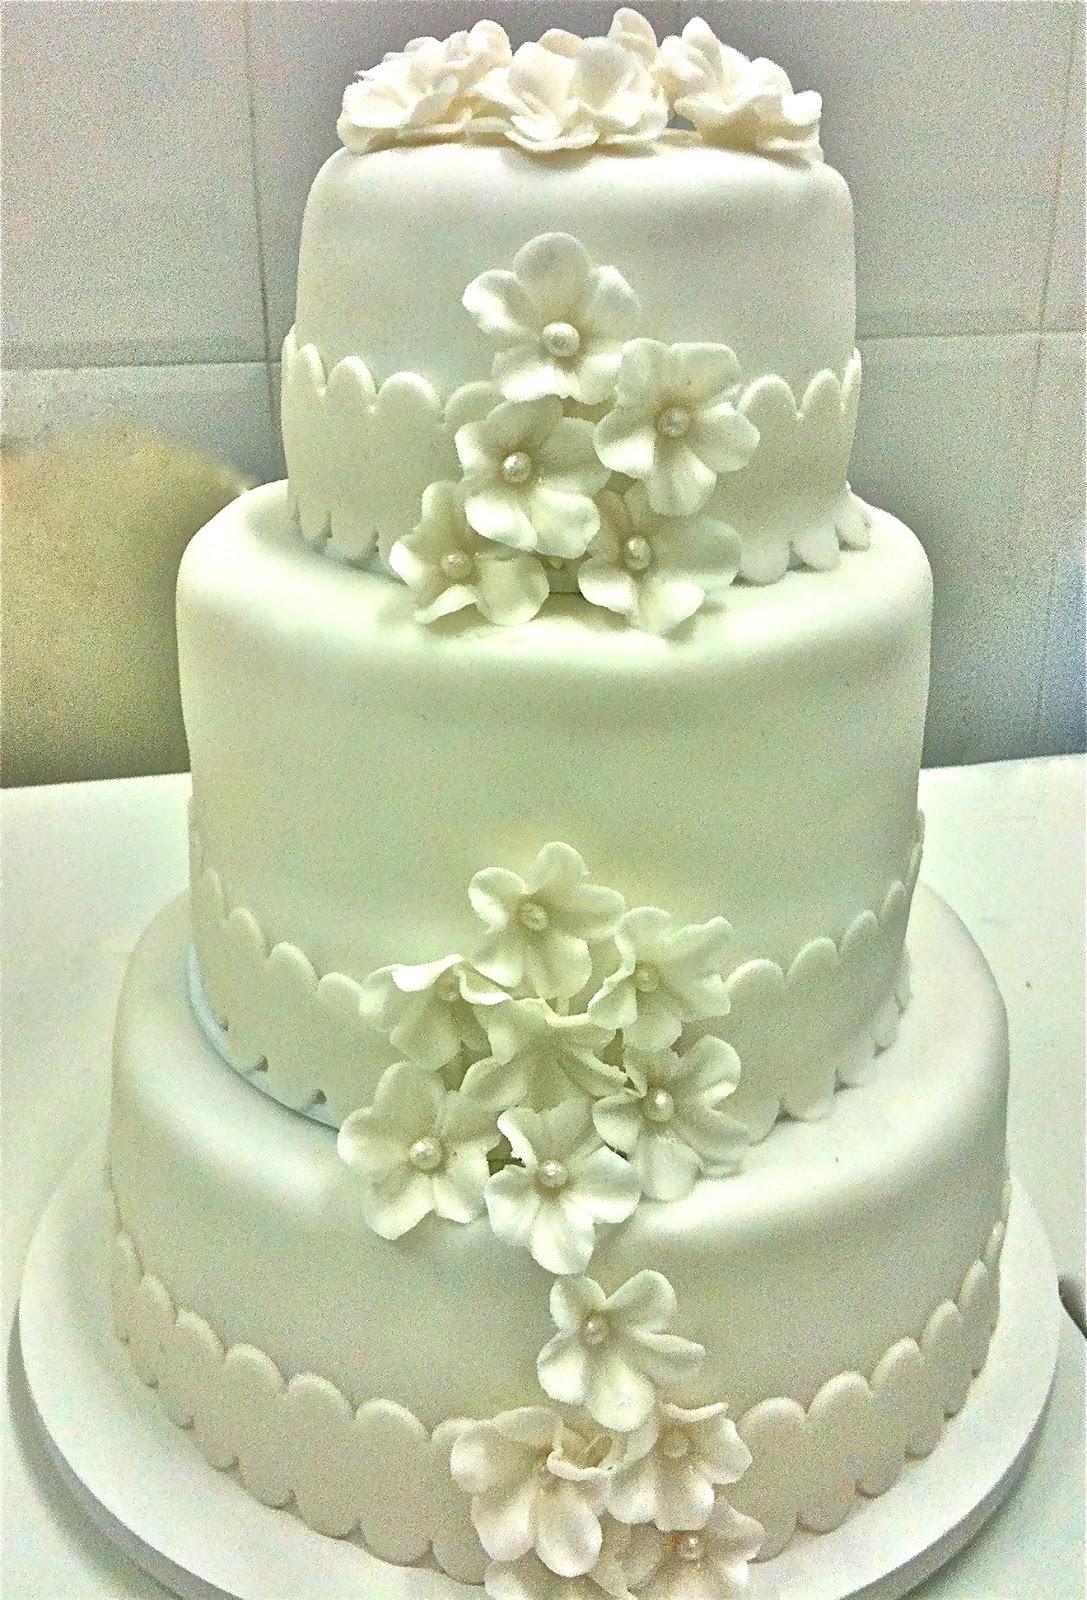 Curso De Cake Design Viseu : 11/2011 Delicias da Lu Confeitaria Artesanal